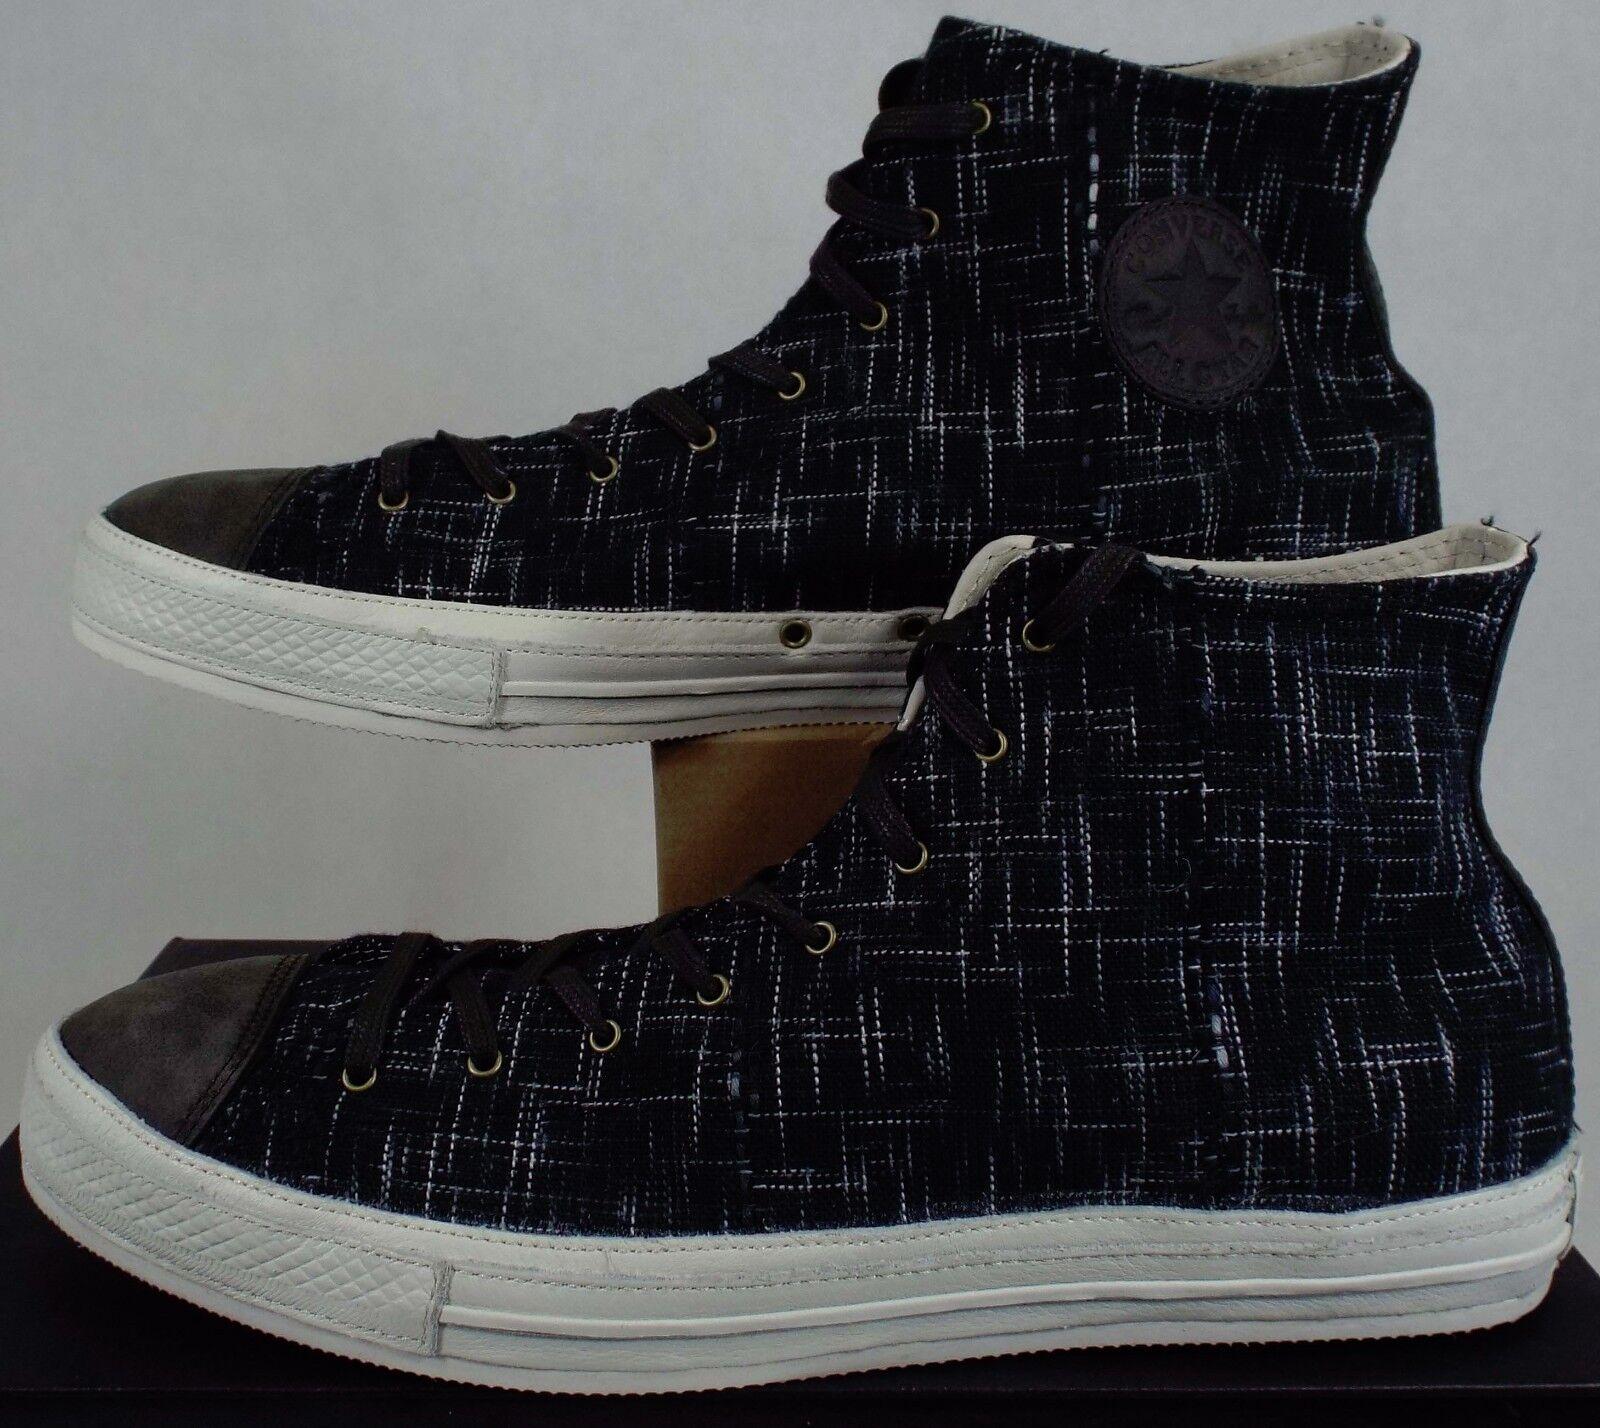 New COLLECTORS hommes 12 CONVERSE CT Post Hi Beluga noir VEGAN Chaussures 125 138485C